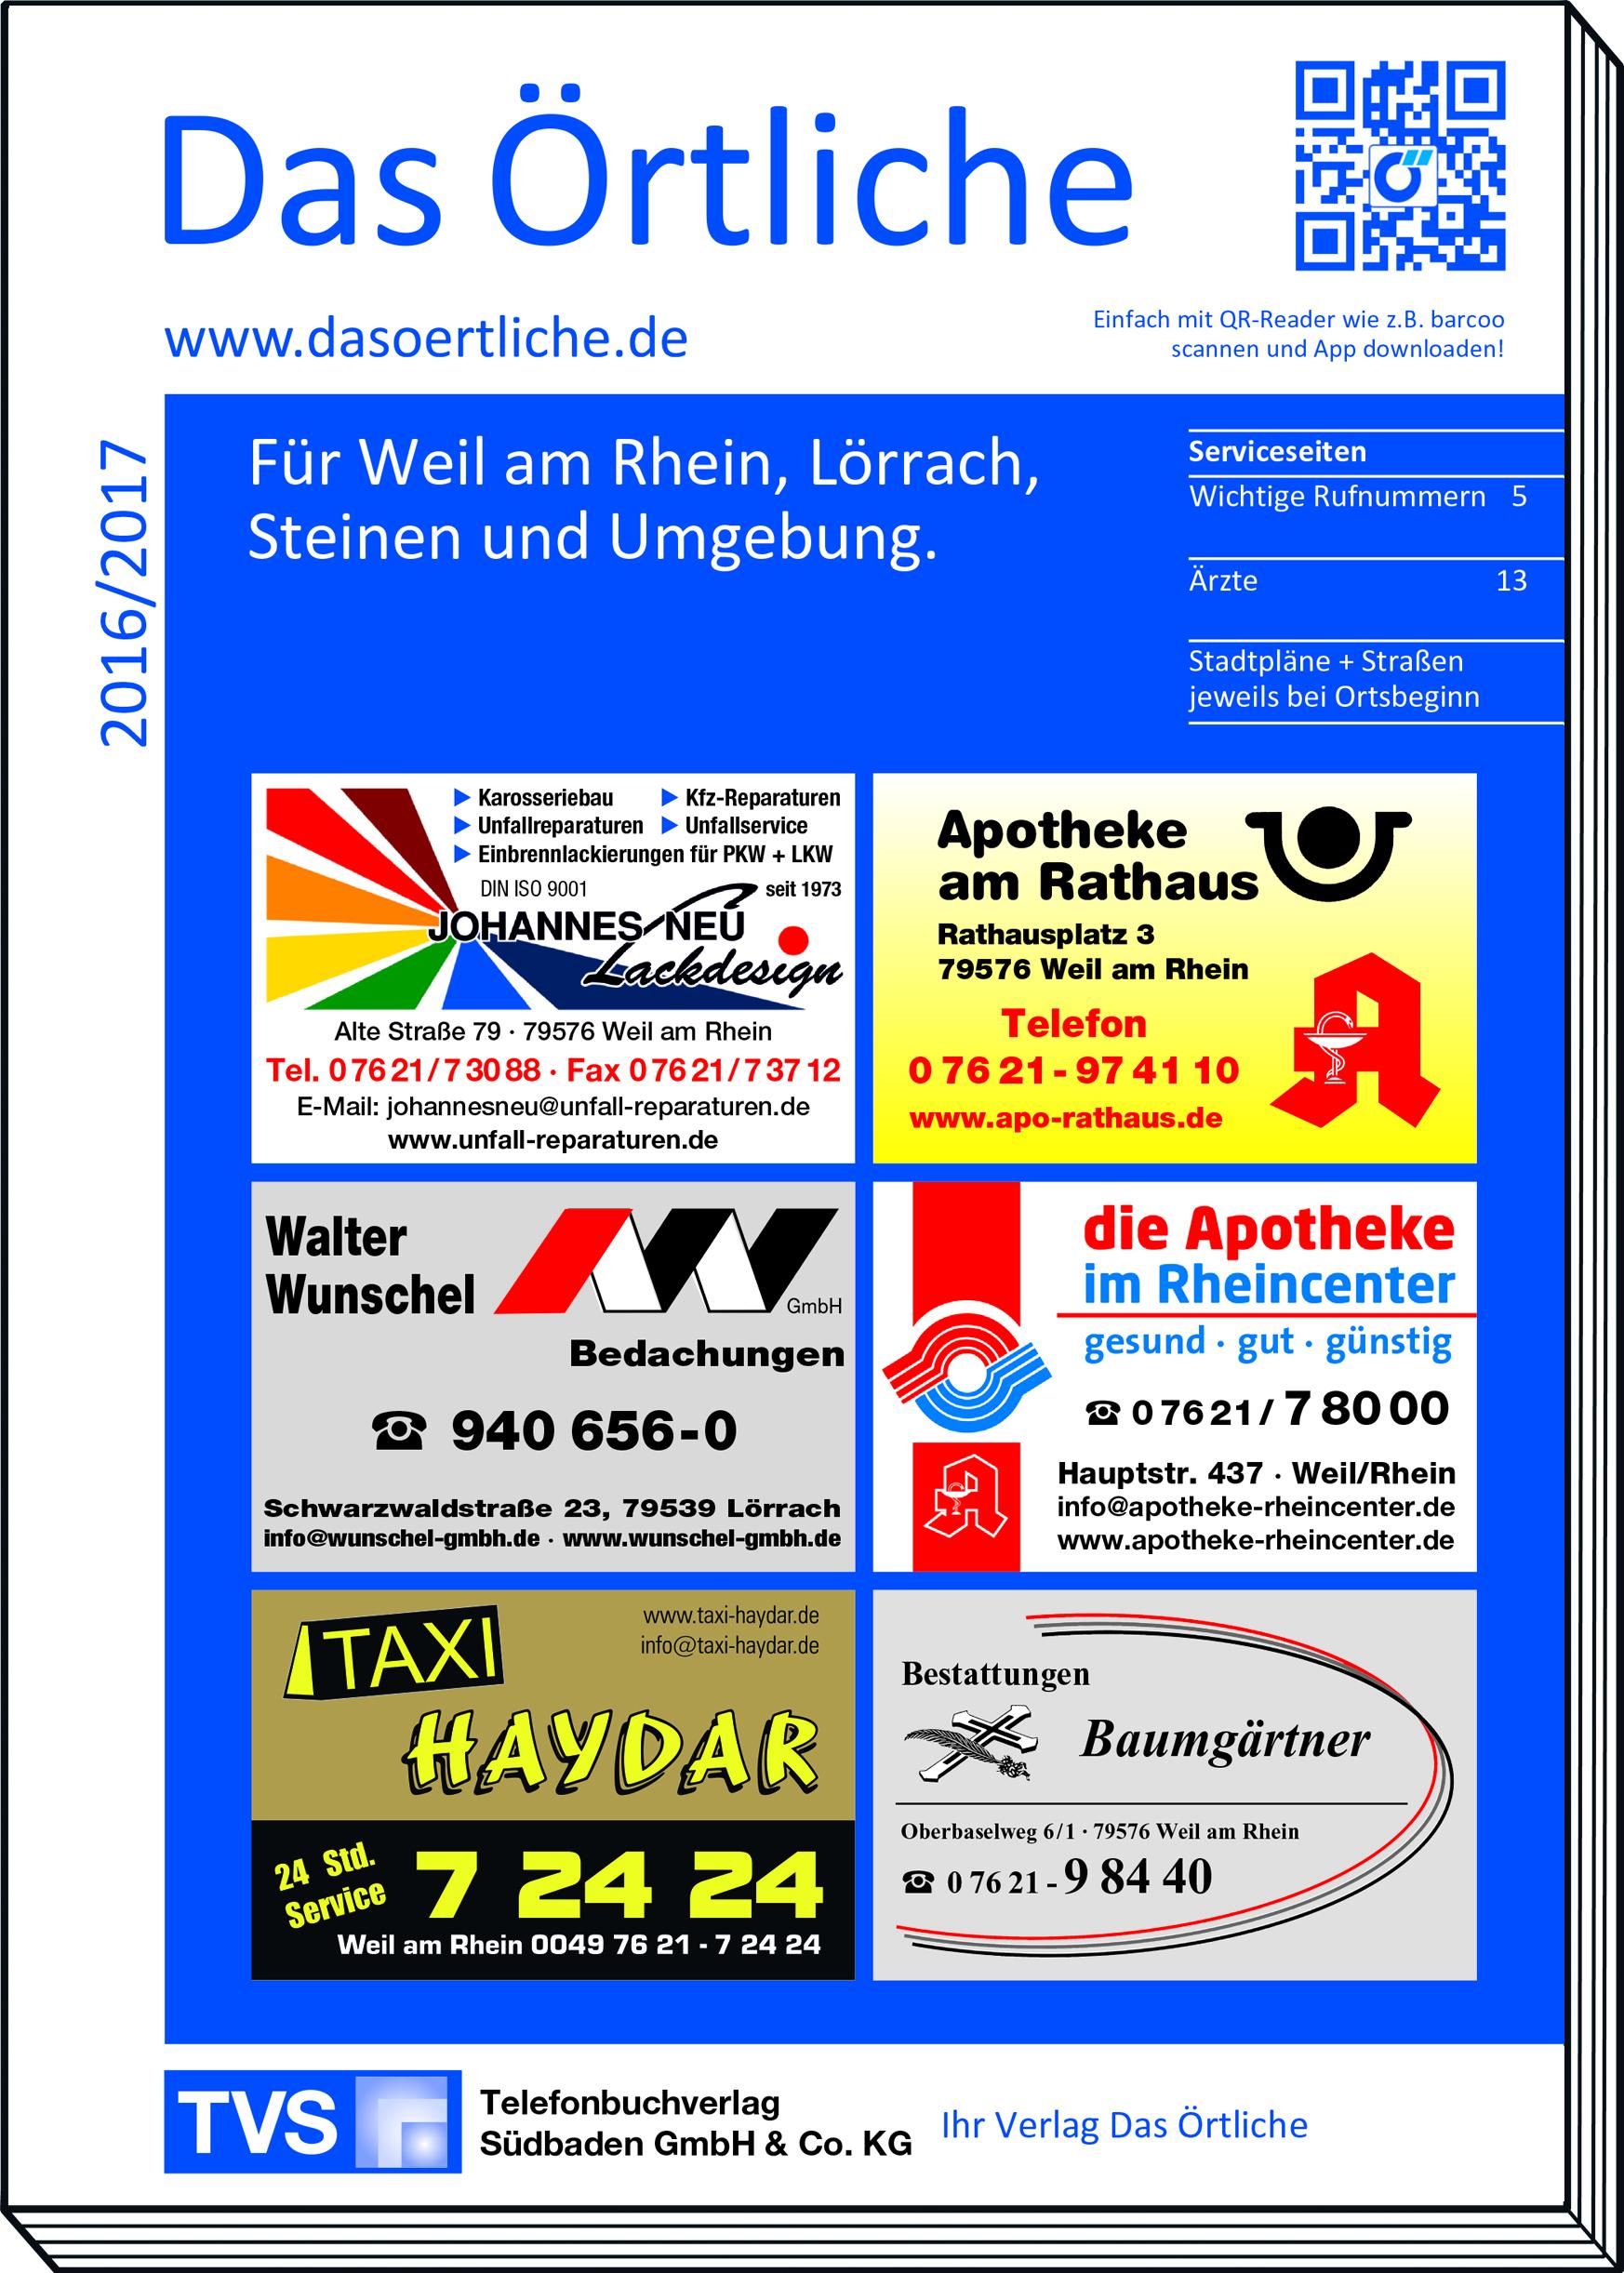 Telefonbuchverlag Südbaden GmbH & Co. KG